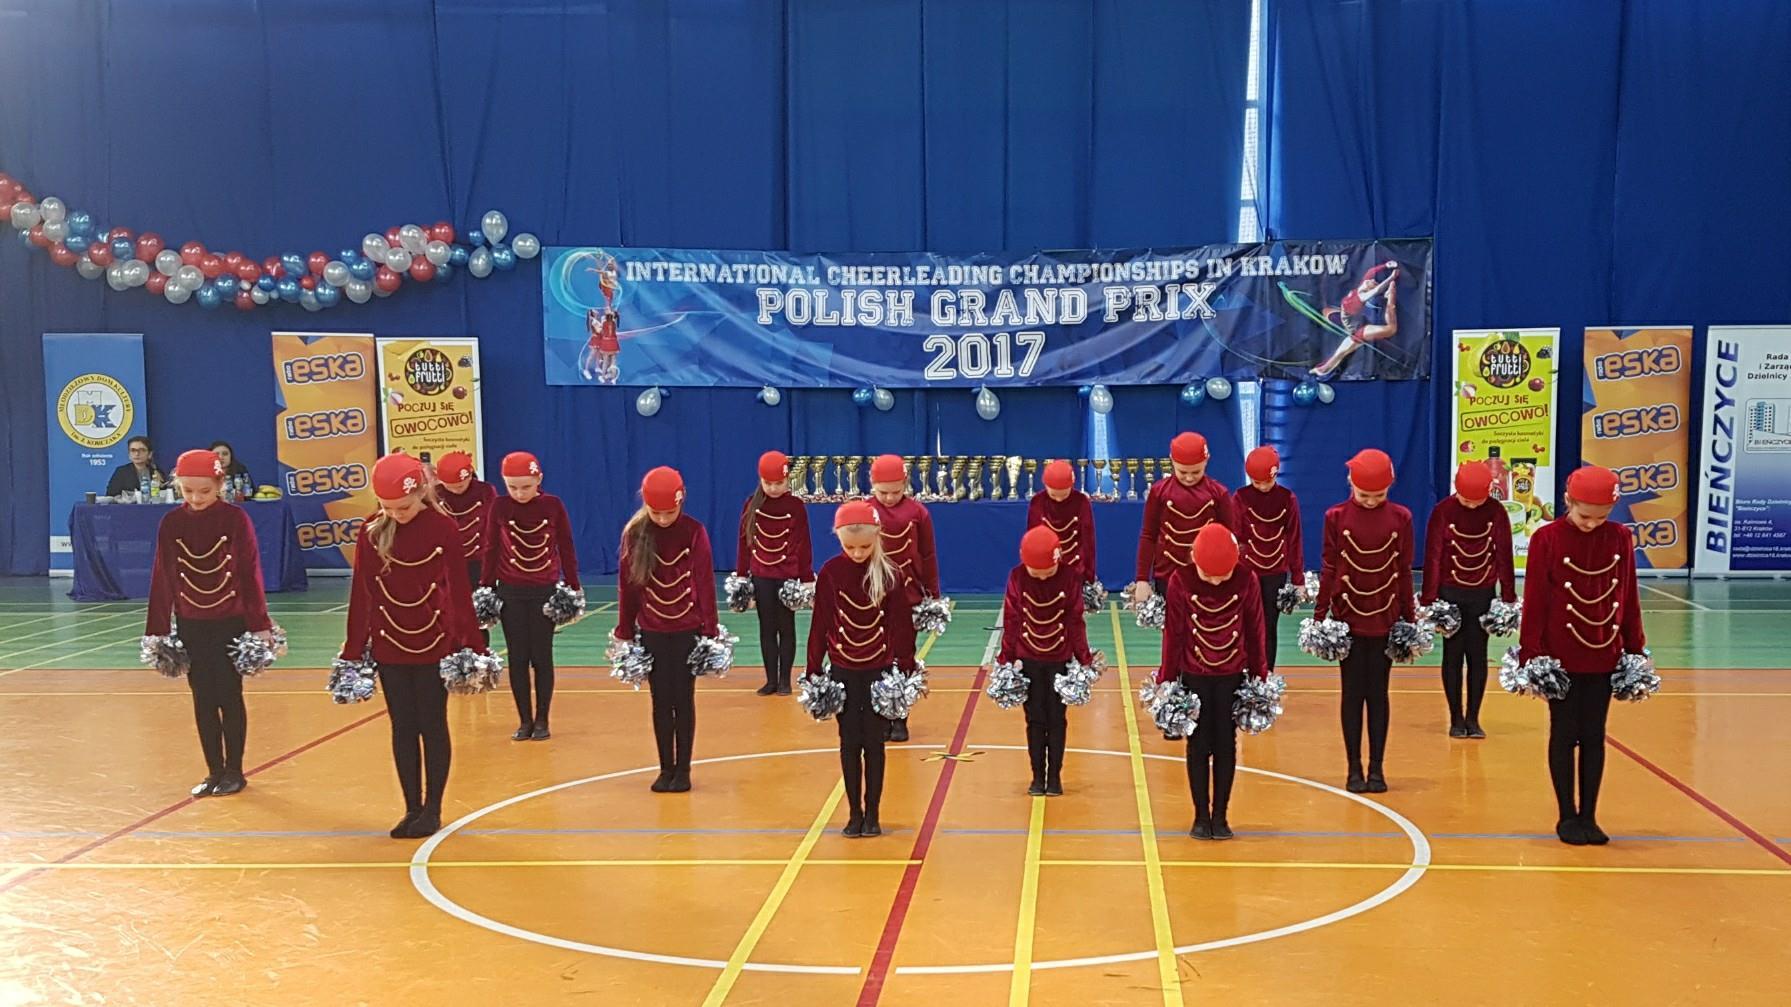 International Cheerleading Championship - Krakow 2017